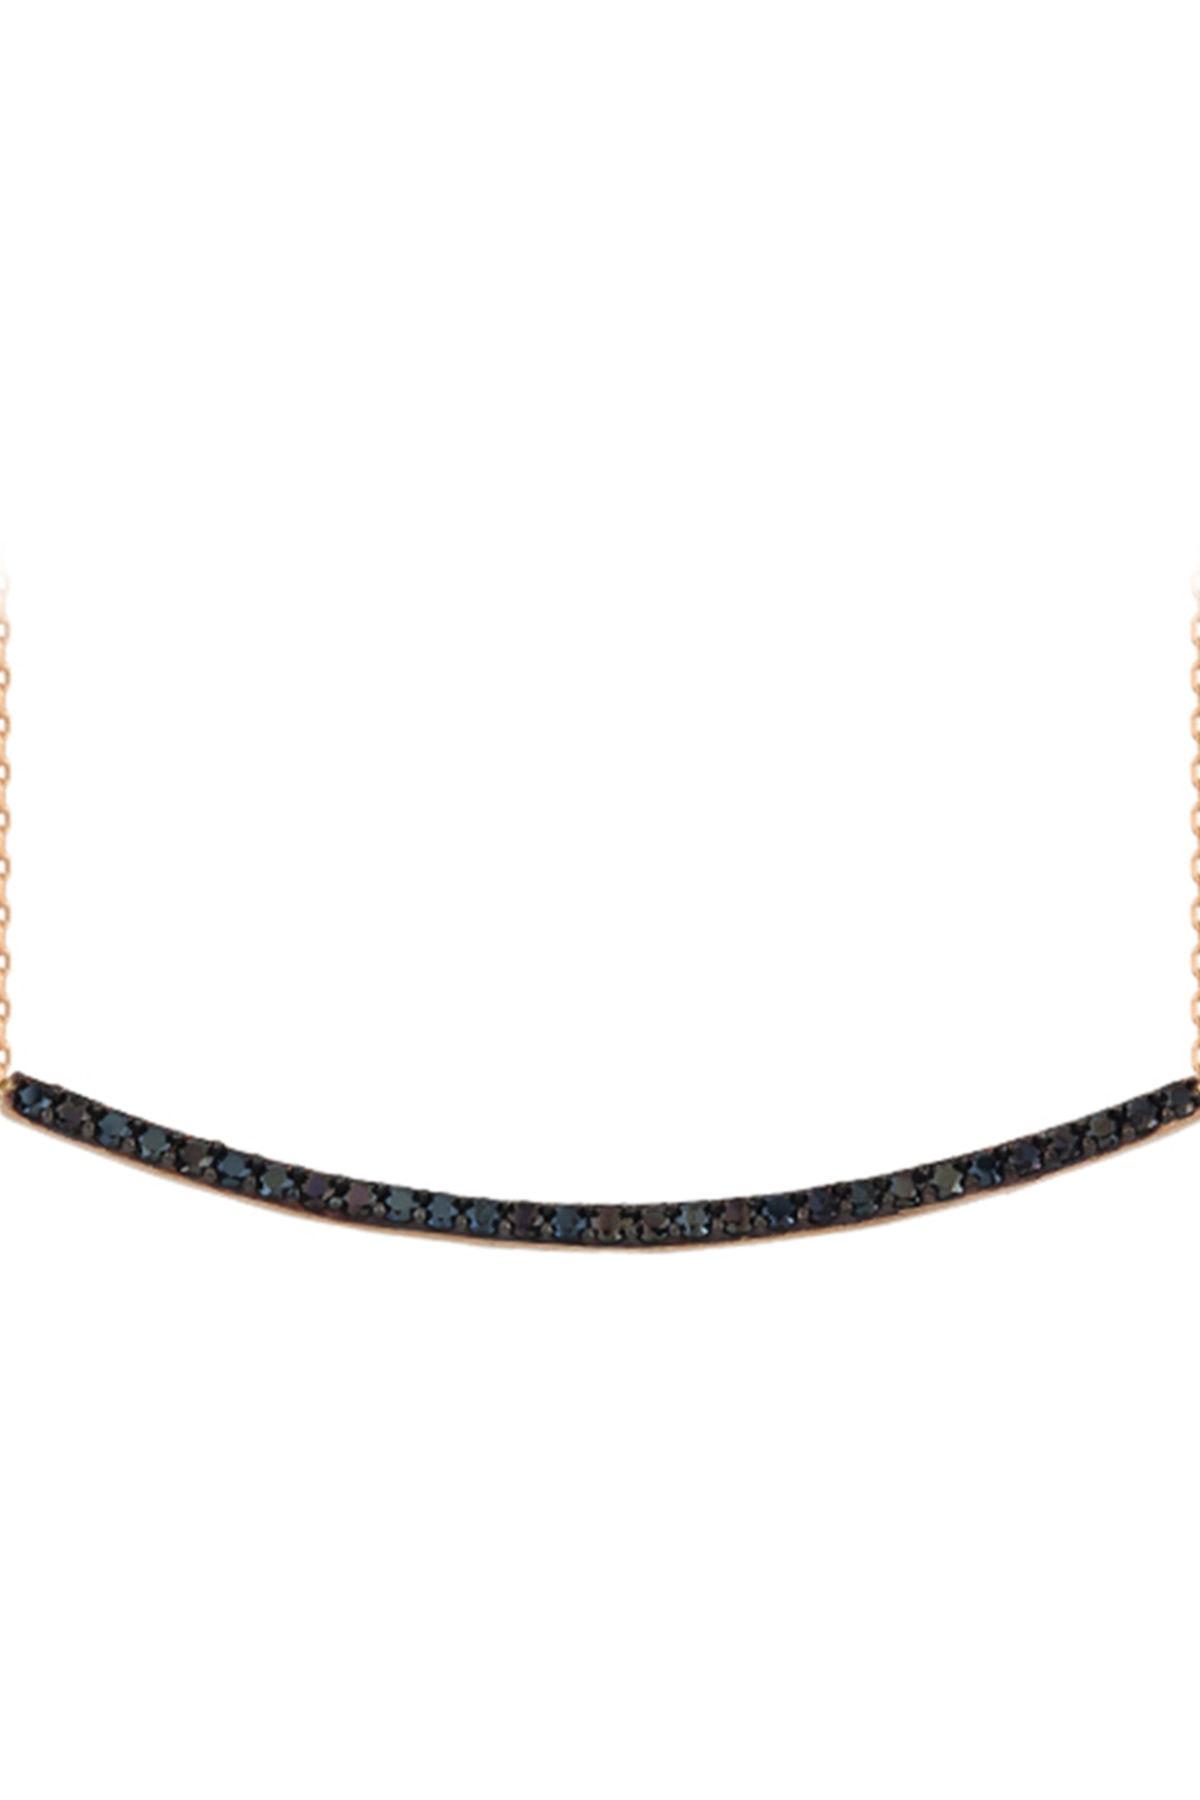 EJOYA 14 Ayar Altın Çubuk Taşlı Kolye 84370 1